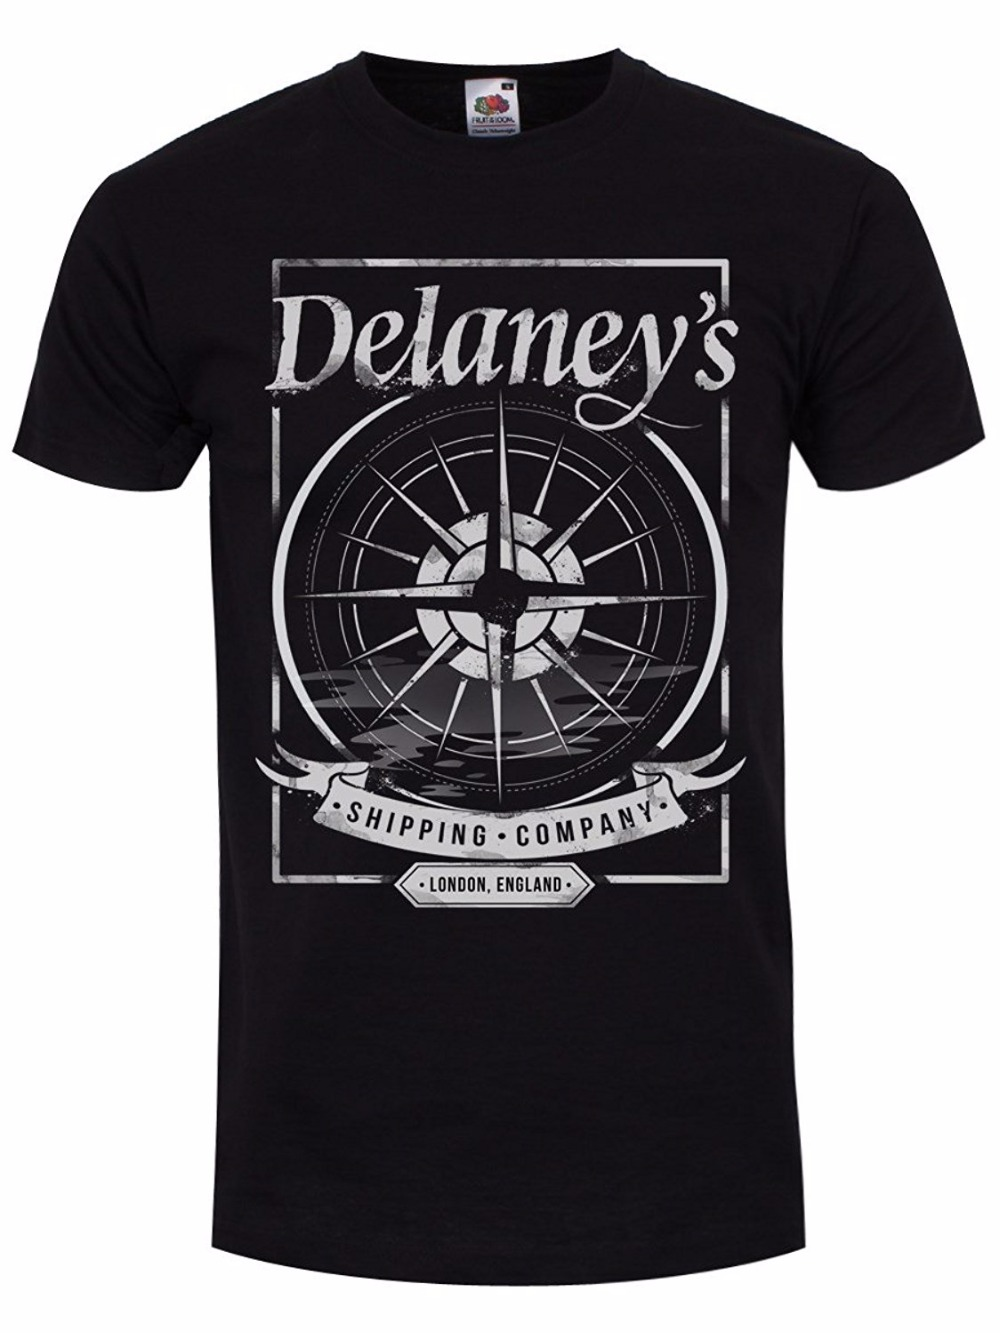 Shirt Shop O-Neck Novelty Short Sleeve Mens Delaneys Shipping Company T-Shirt Black Tees For Men